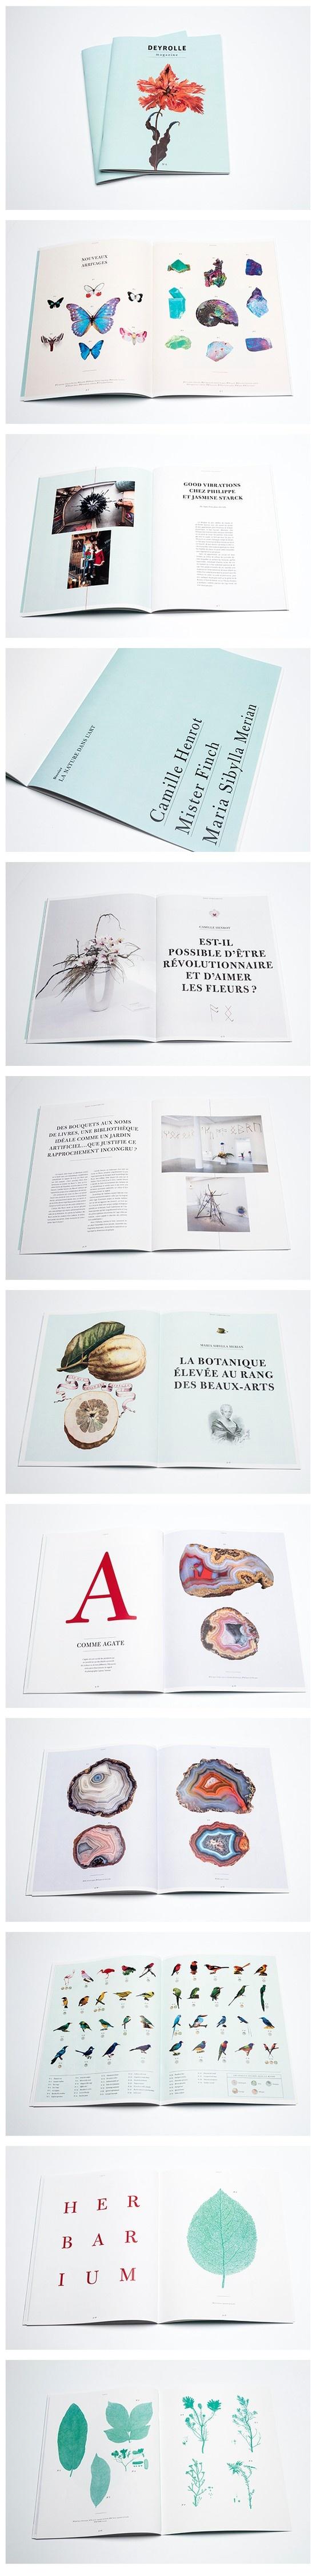 Deyrolle magazine on Behance